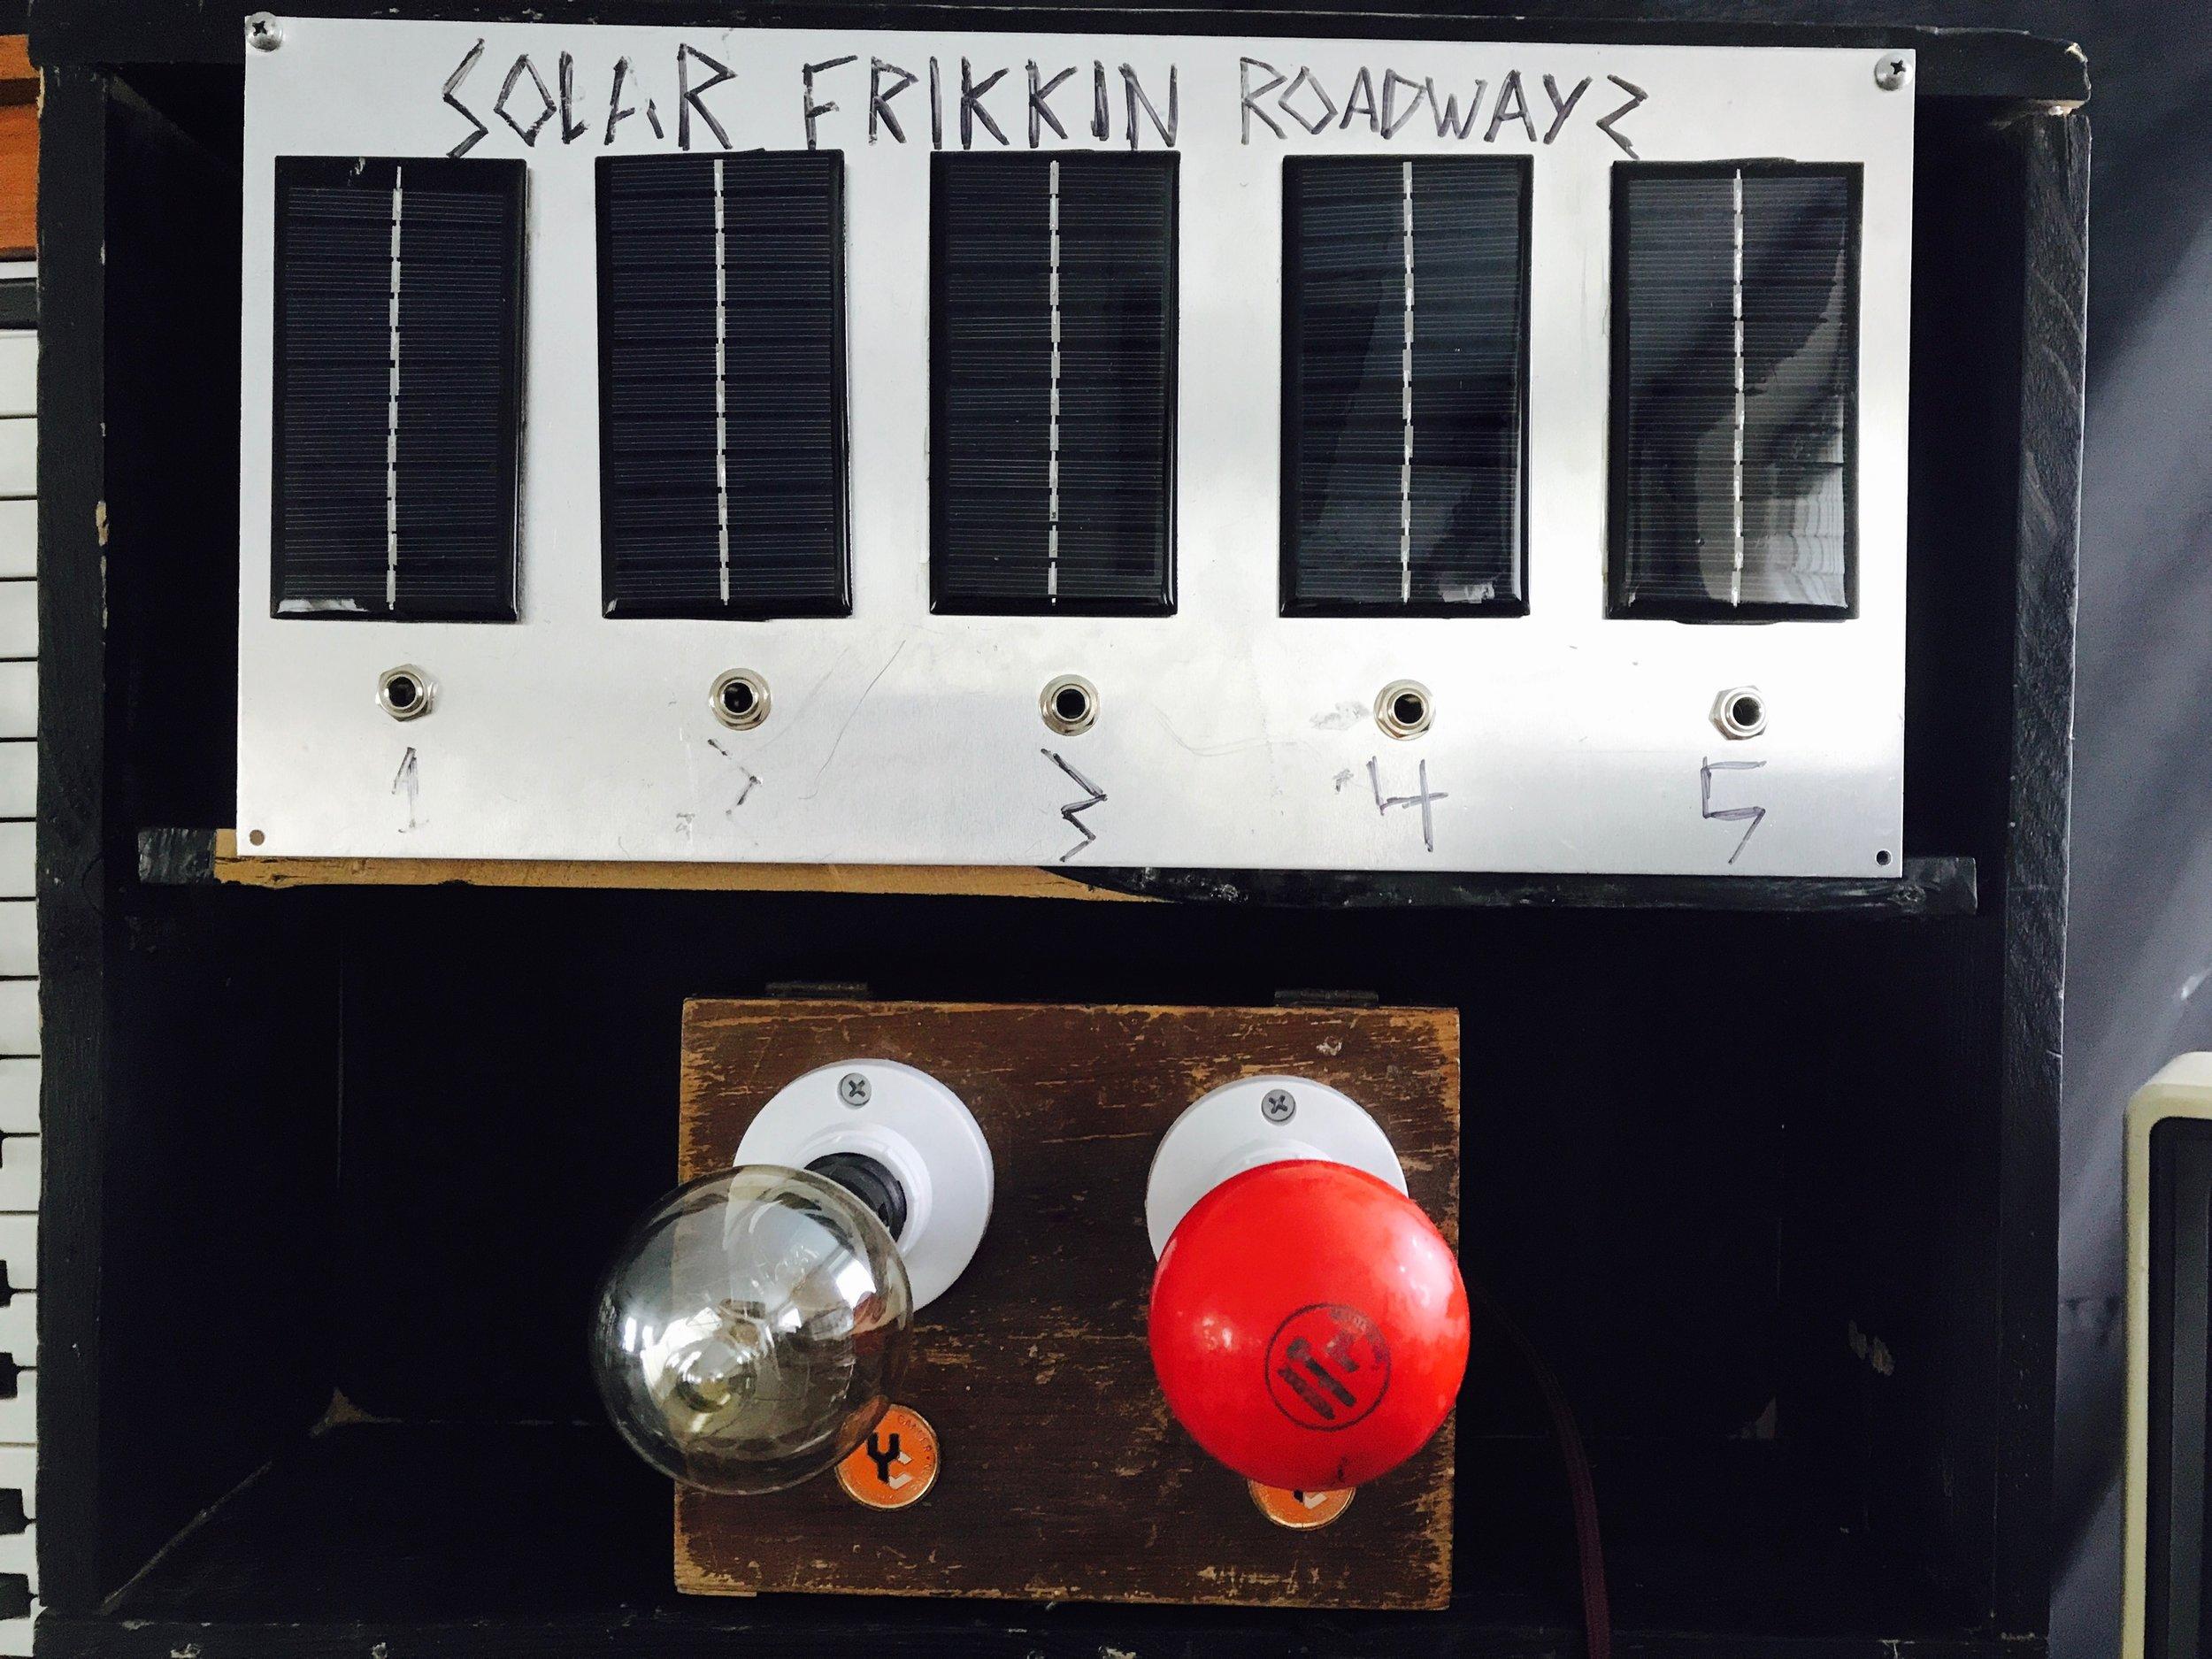 SOLAR PANELS SYNTH EXPRESSION. SOLAR FRIKKING ROADWAYS